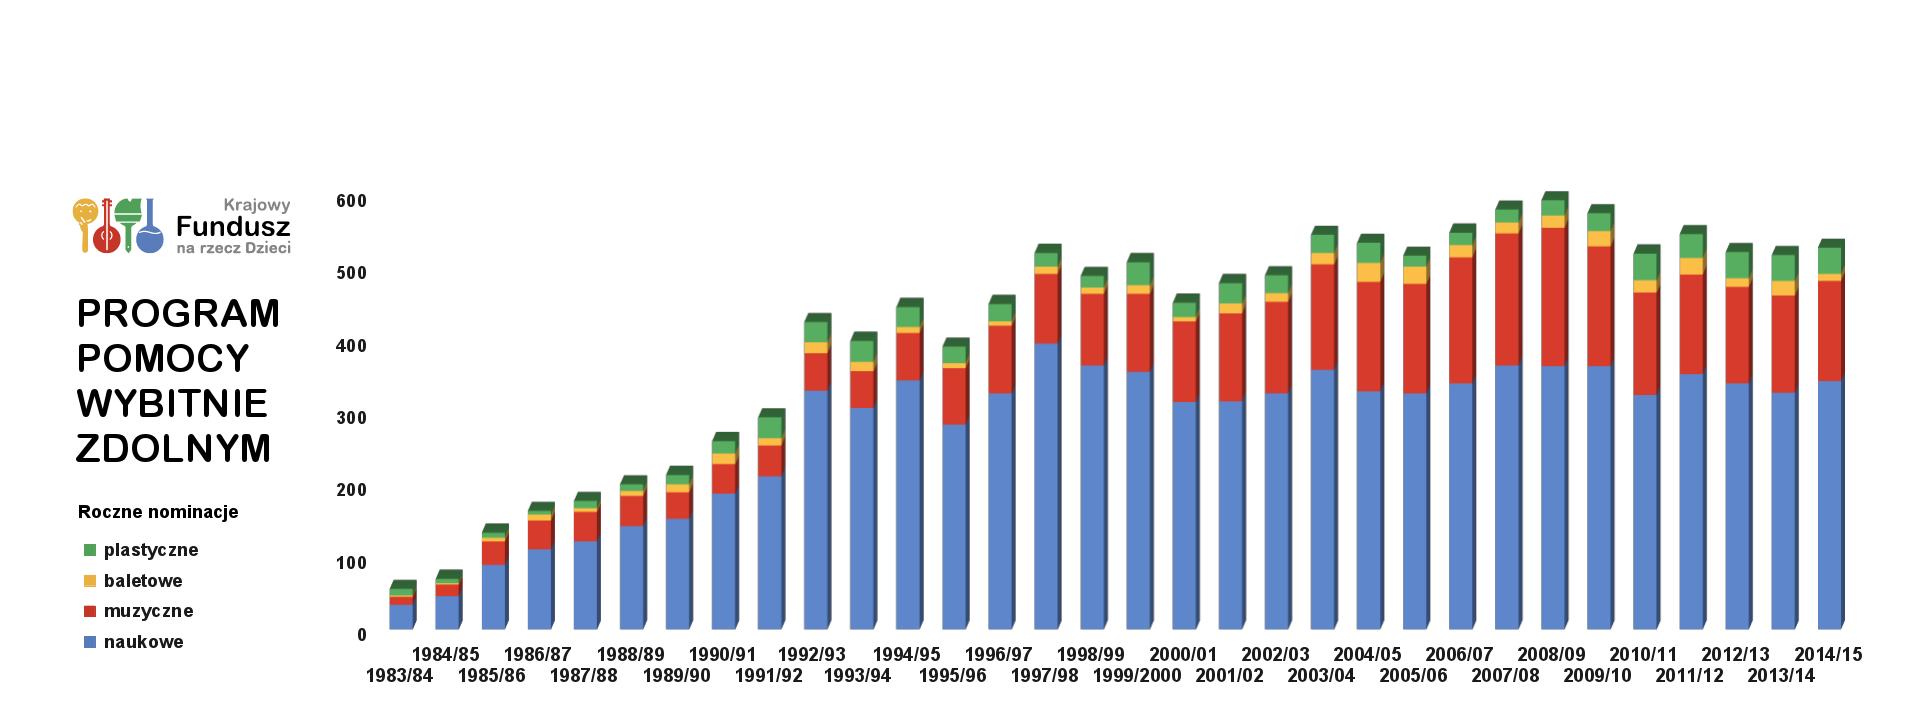 KFnrD - program pomocy wybitnie zdolnym 1983-2014